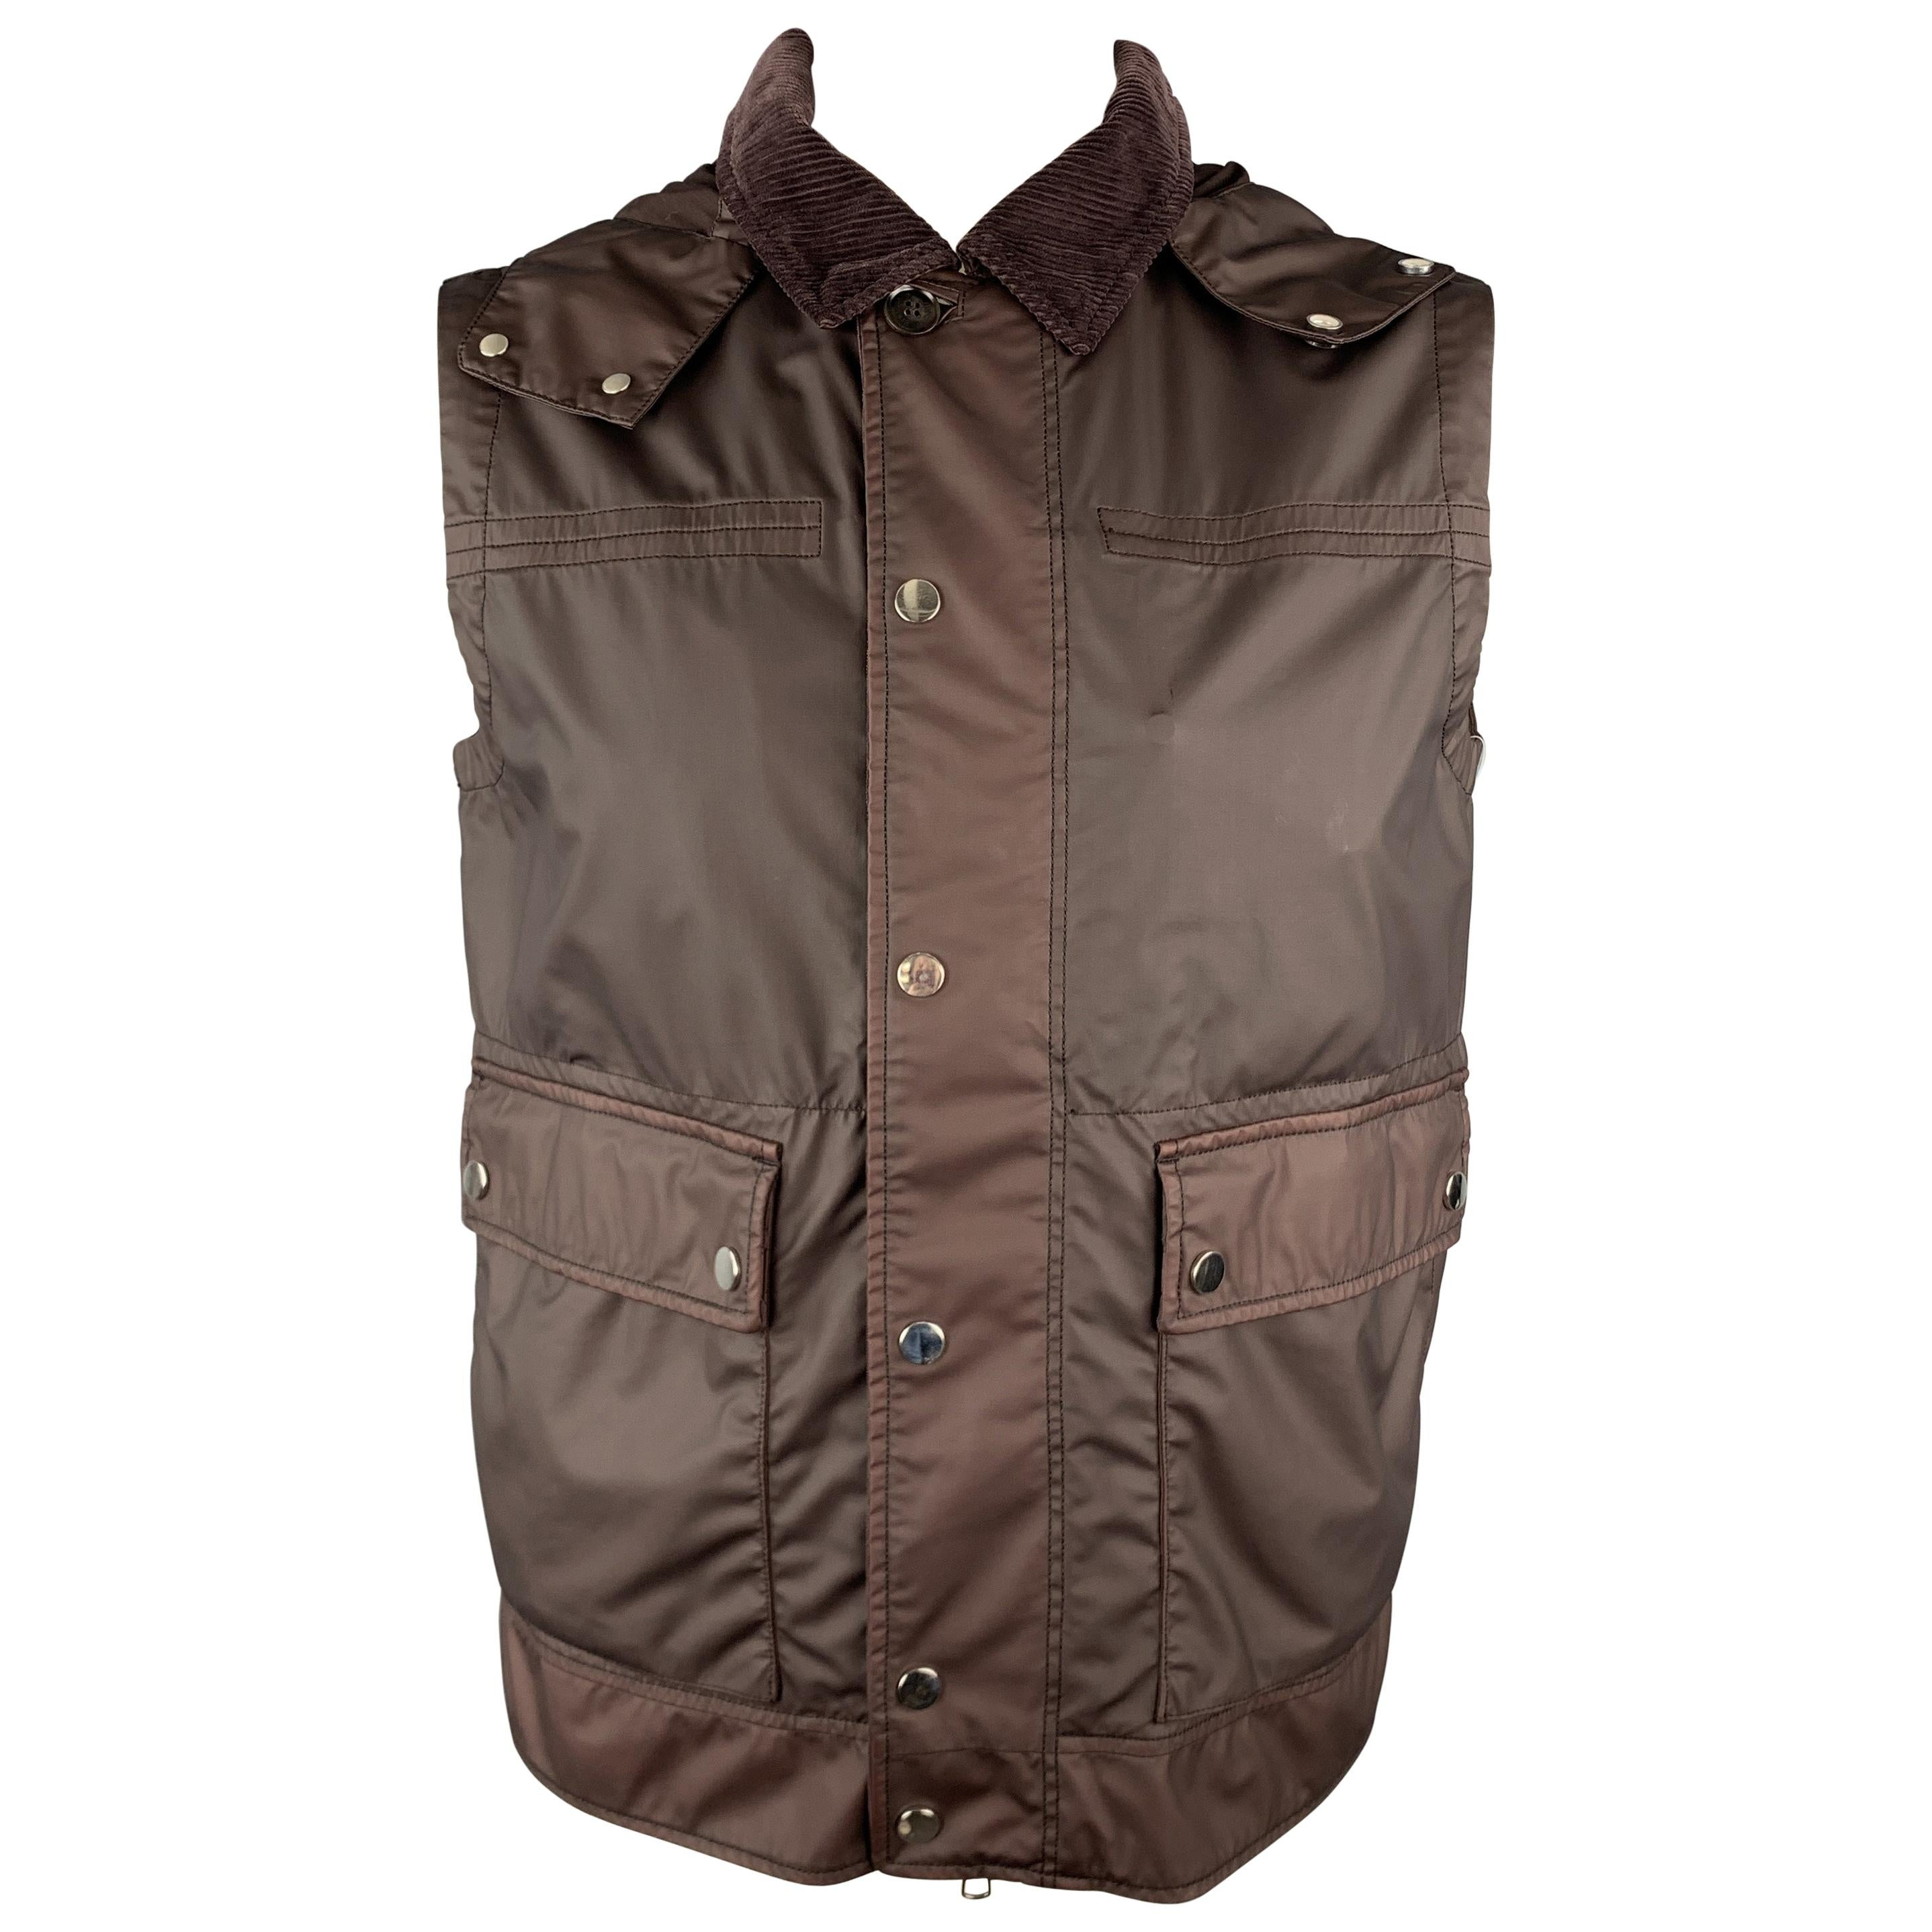 ERMENEGILDO ZEGNA Burgundy Size 40 Coated Wool Detachable Hood Vest